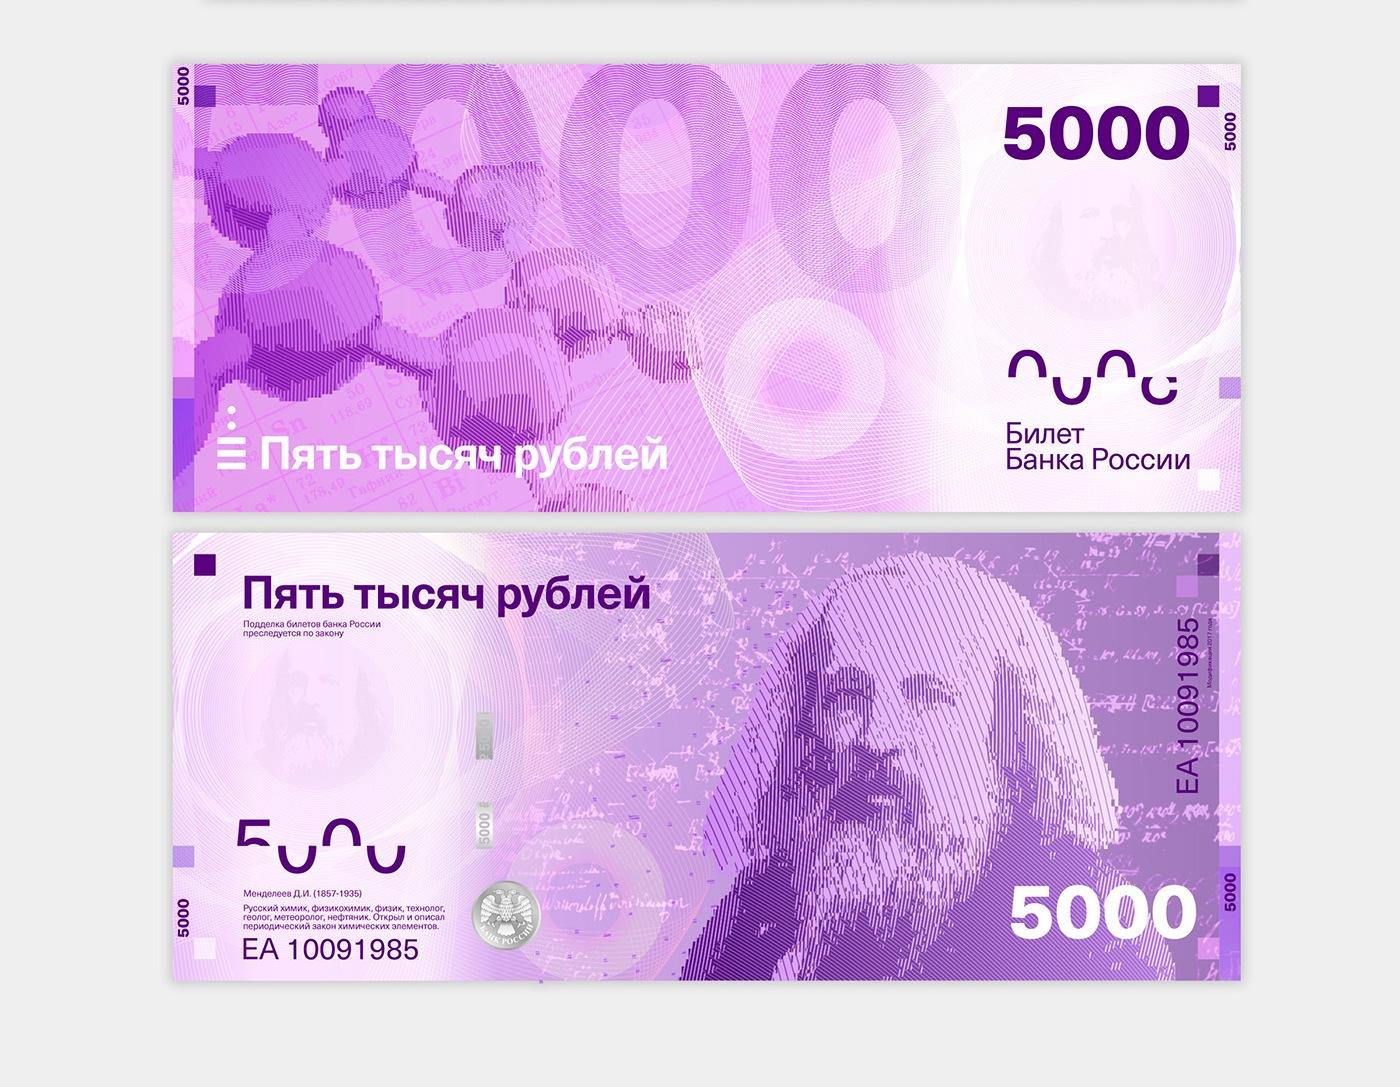 На купюре номиналом 5000 рублей — химик Дмитрий Менделеев